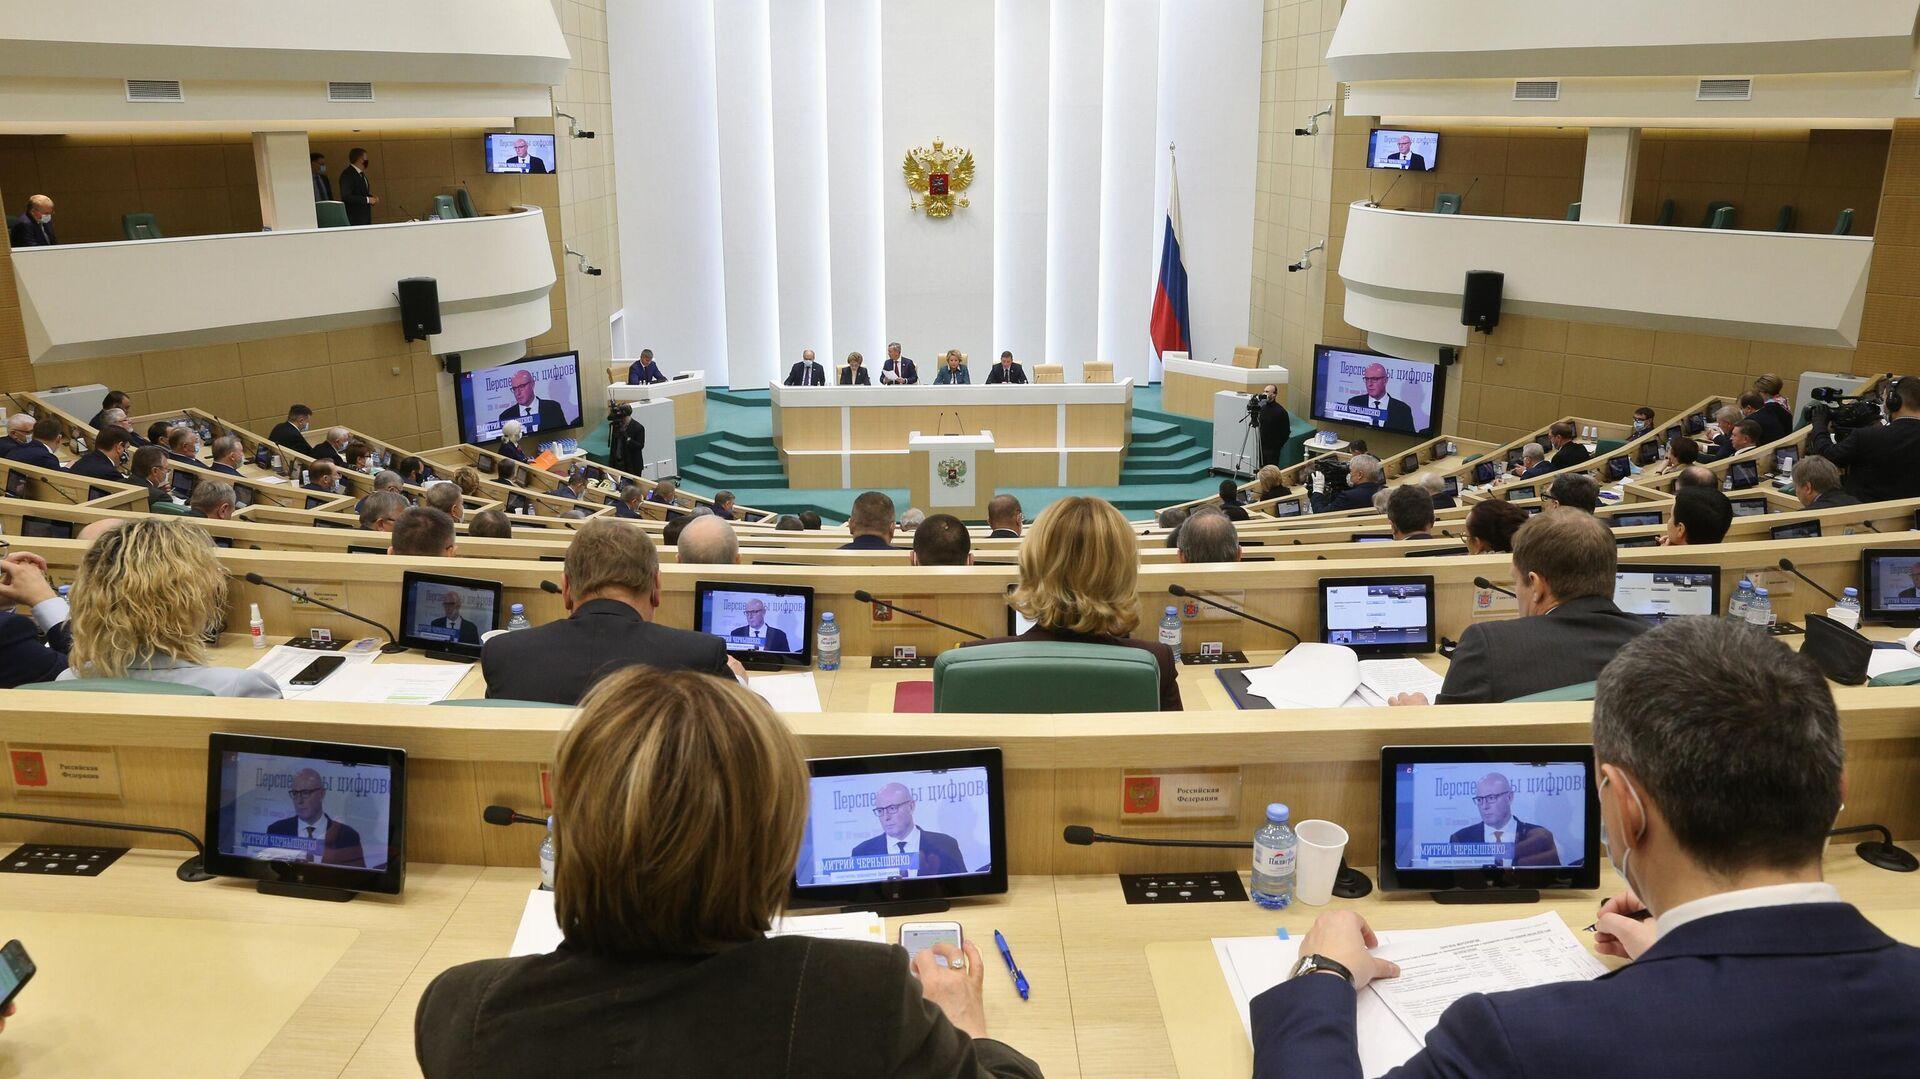 Заседание Совета Федерации РФ  - РИА Новости, 1920, 22.01.2021